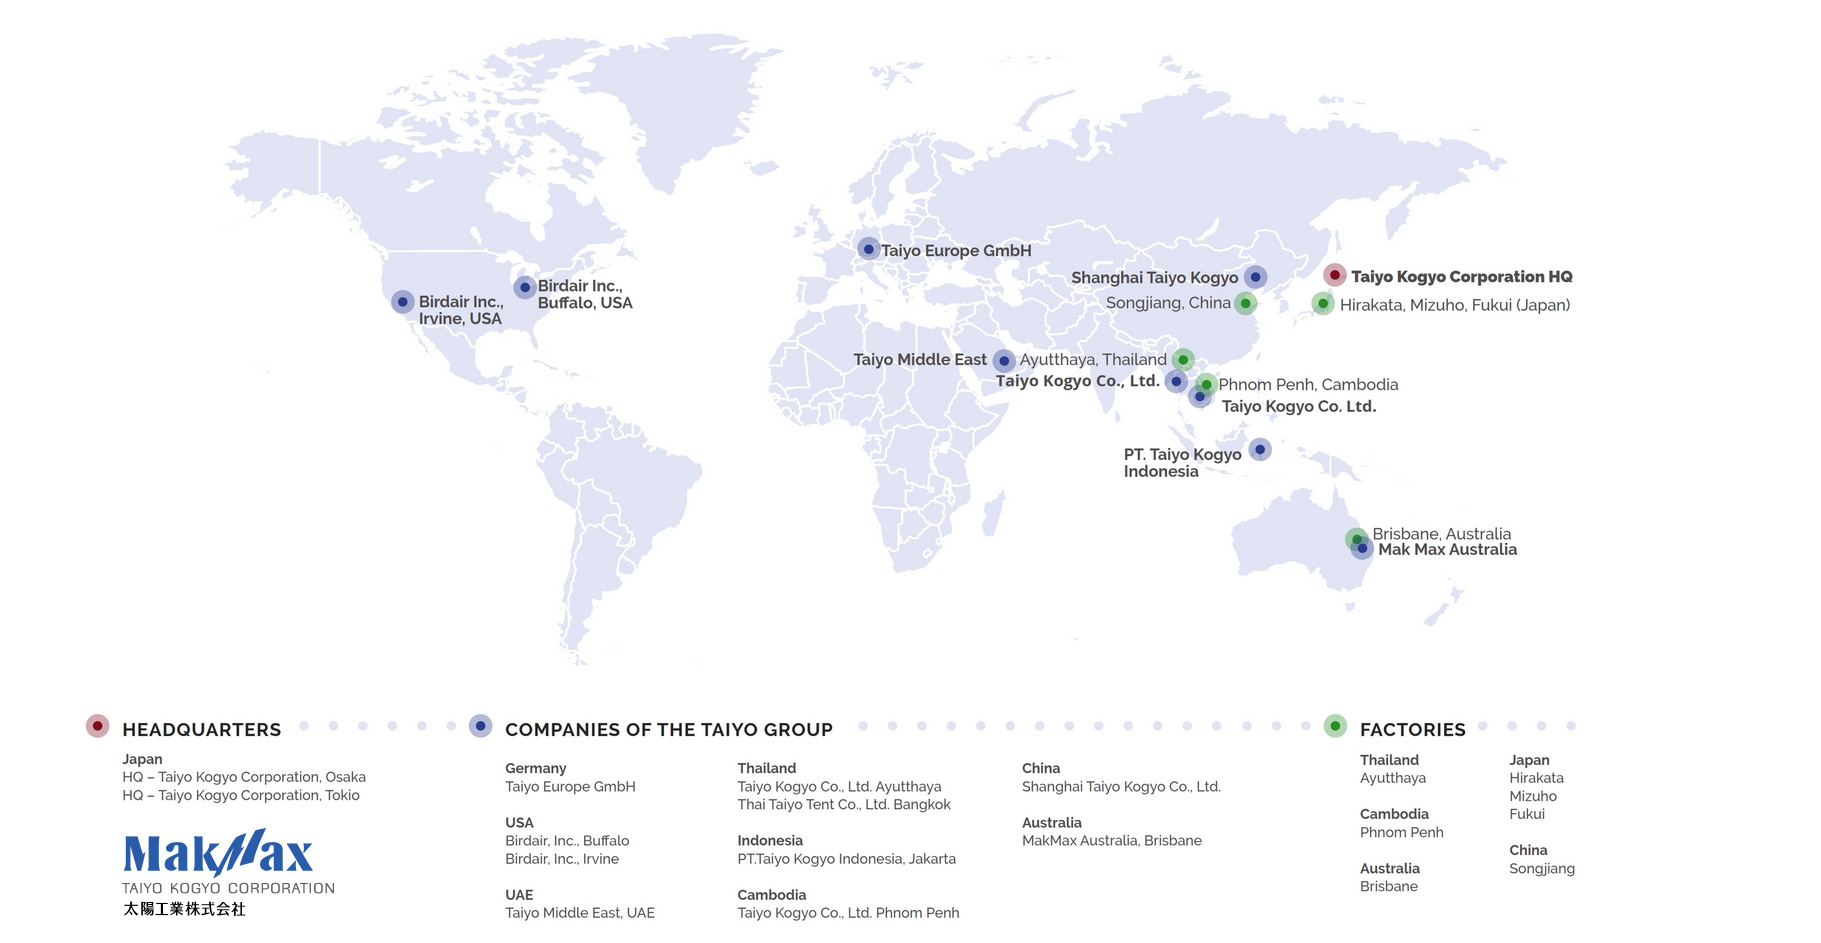 Taiyo Kogyo Corporation Global Presence